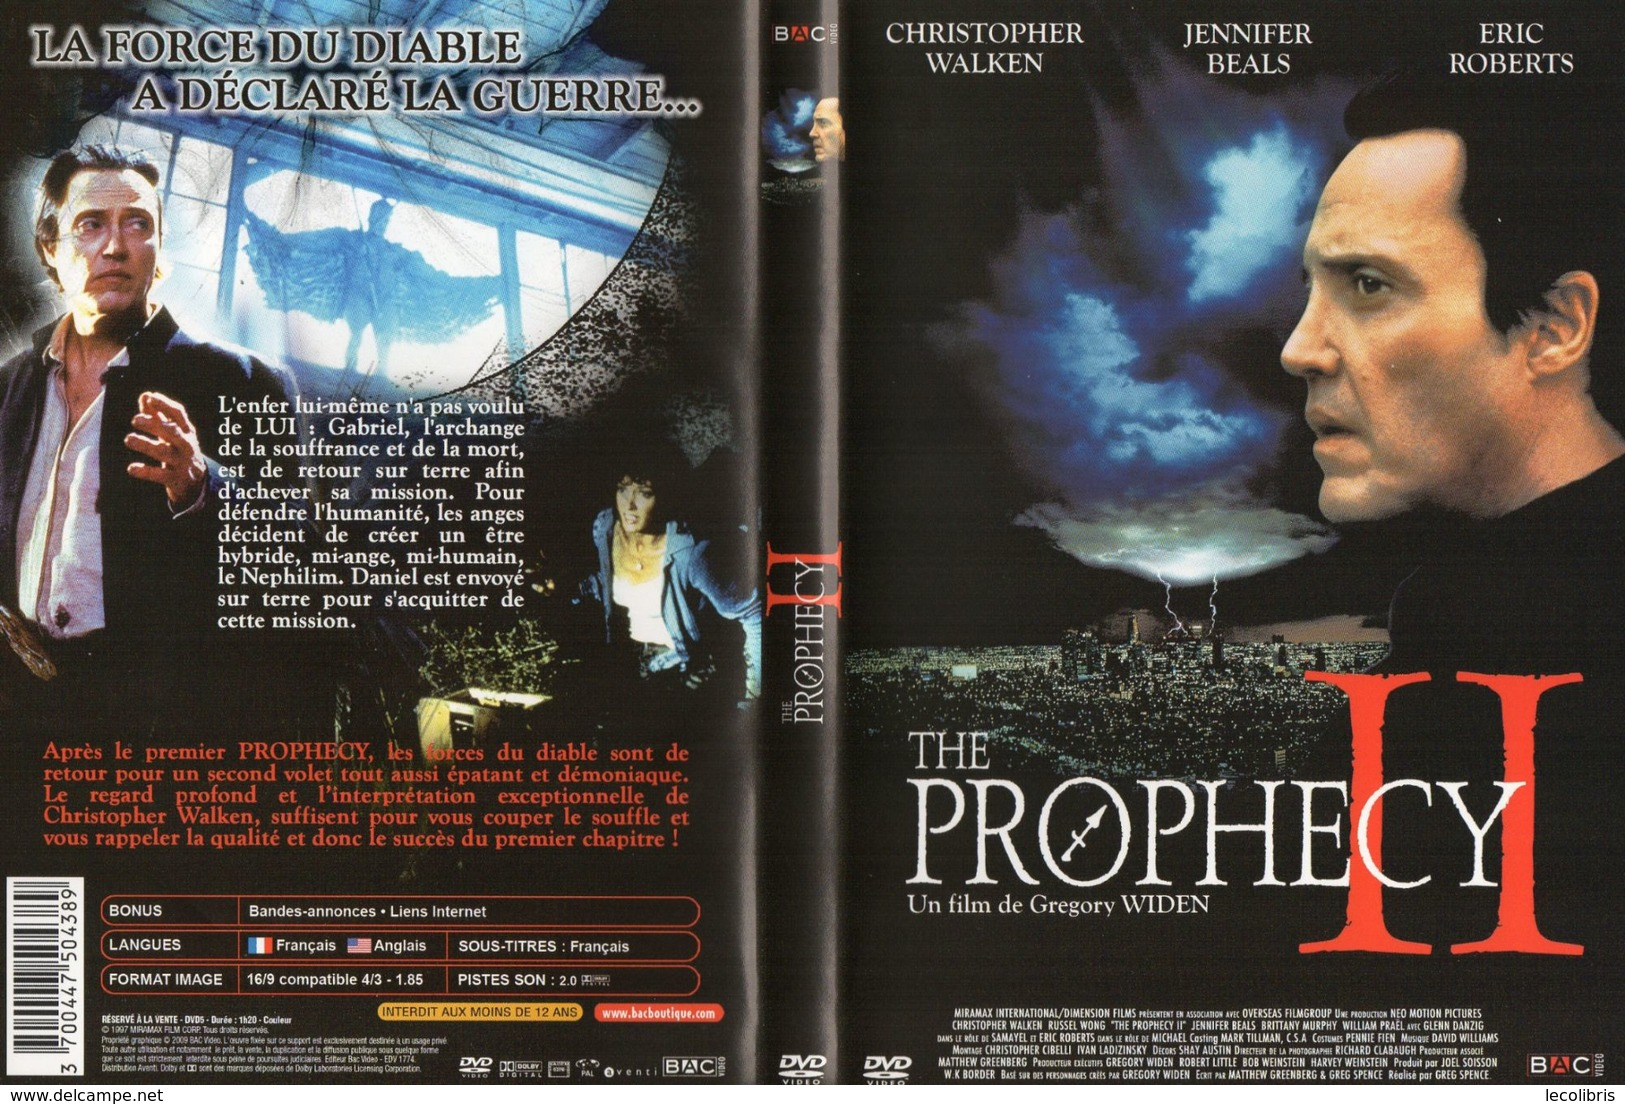 THE PROPHECY  °°°° - Sci-Fi, Fantasy